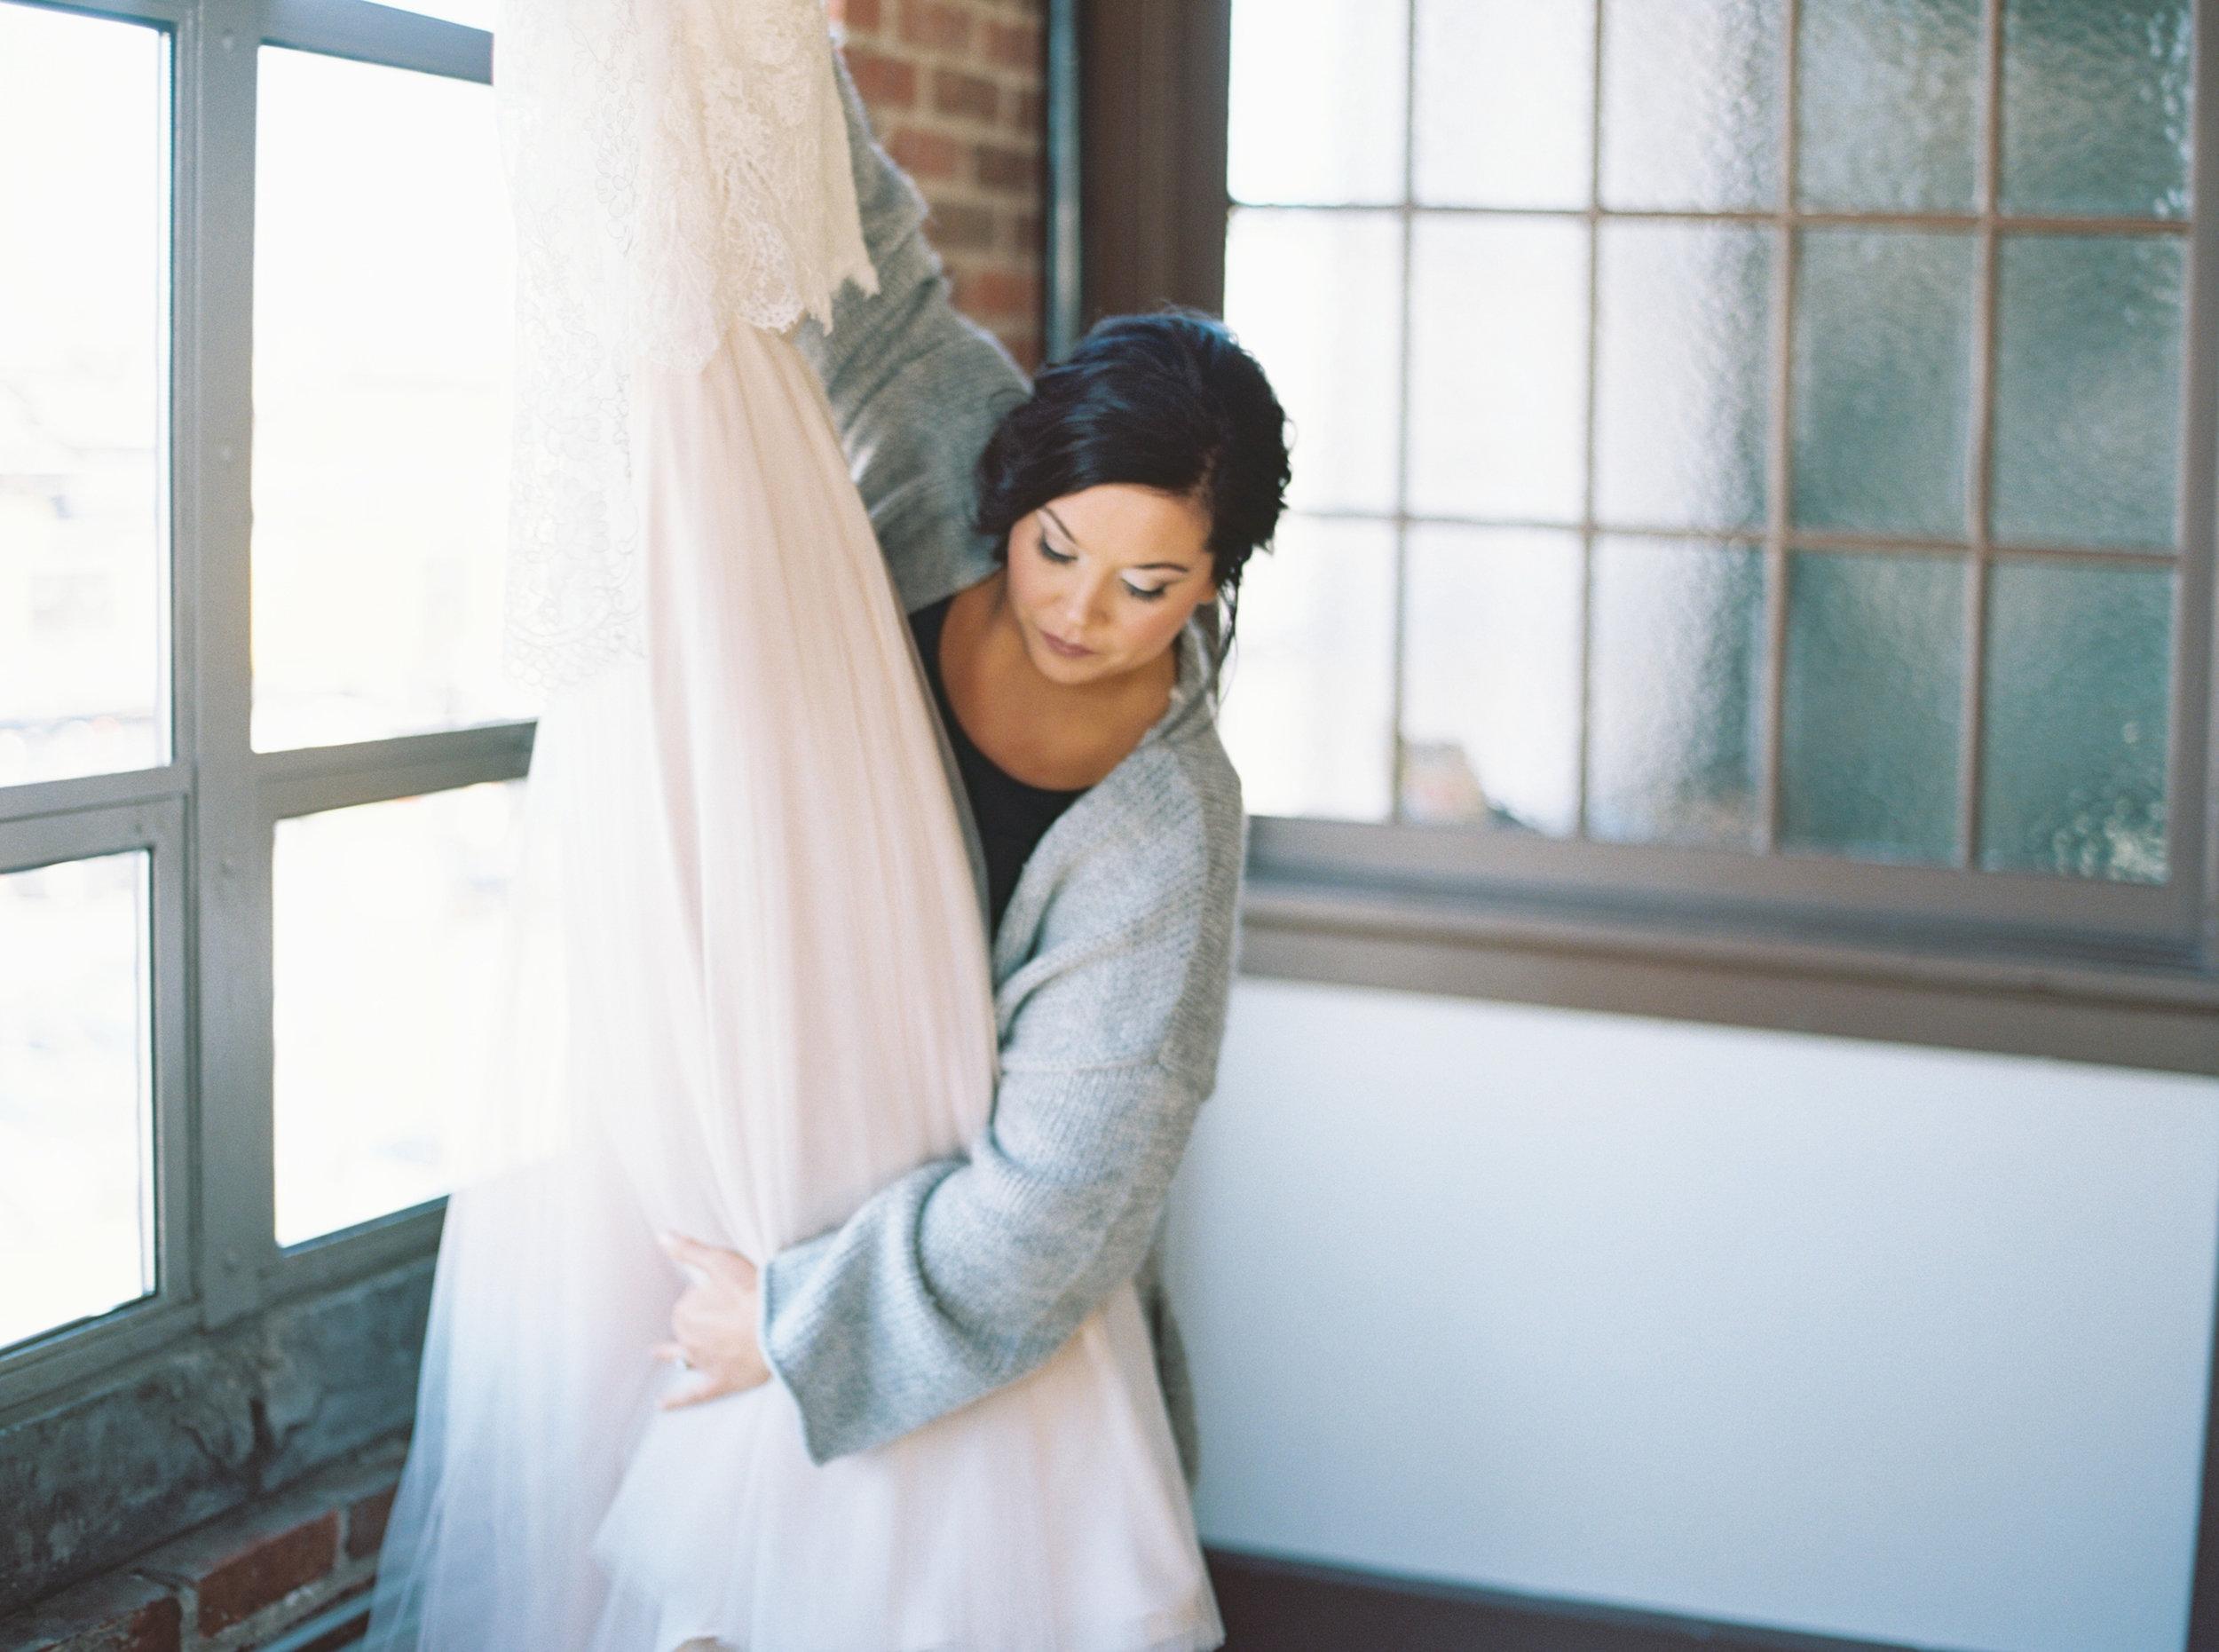 Lauren_Jeremy_Standard_Wedding_Knoxville_Abigail_Malone_Photography_FIlm-66.jpg